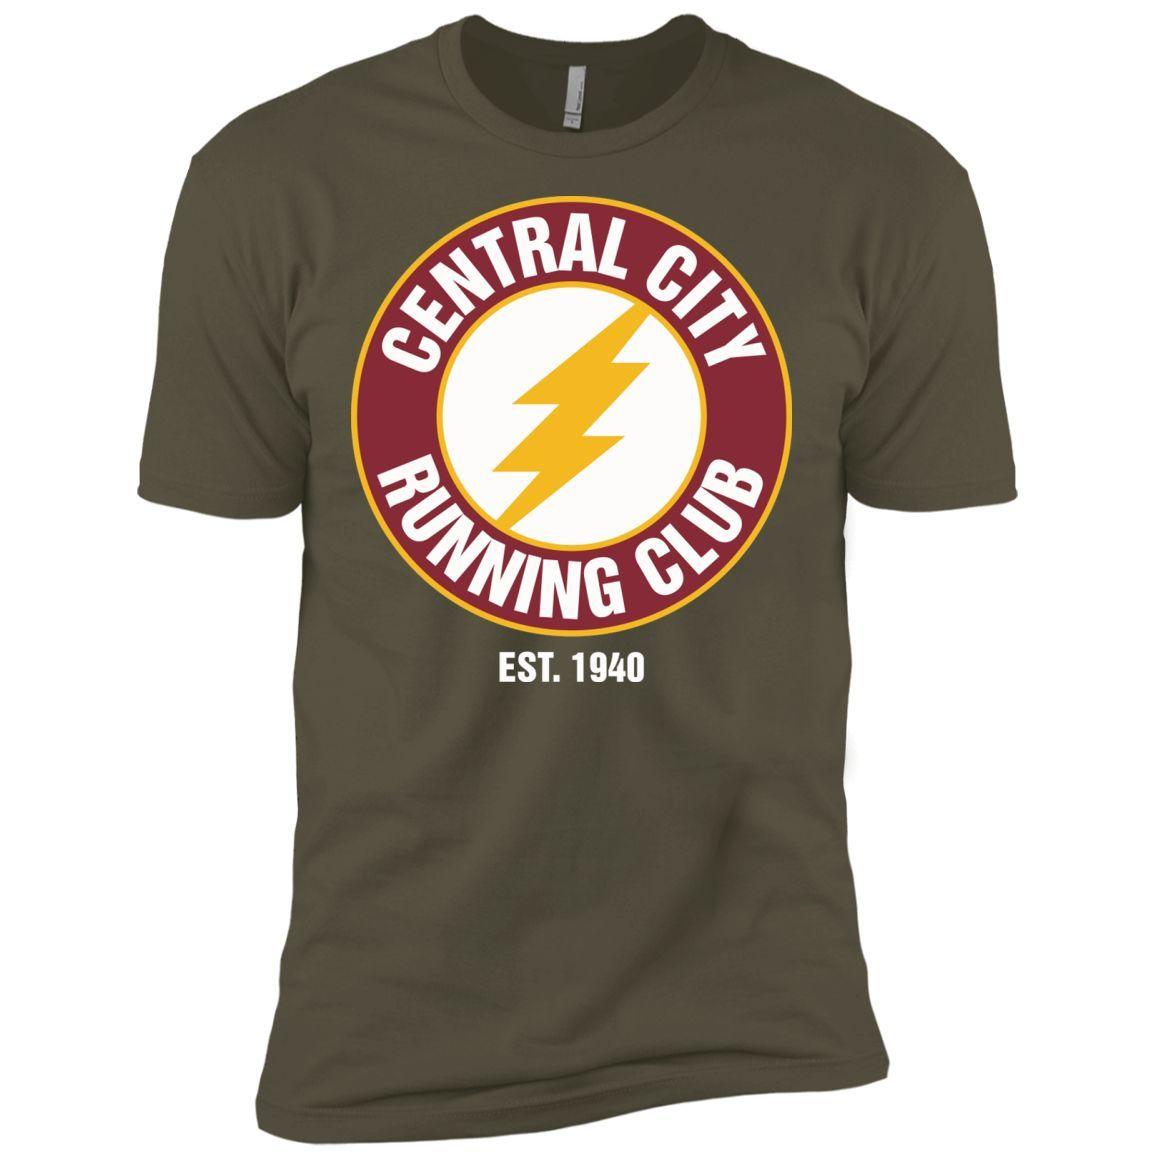 Central City Running Club T Shirt -01 Next Level Premium Short Sleeve Tee